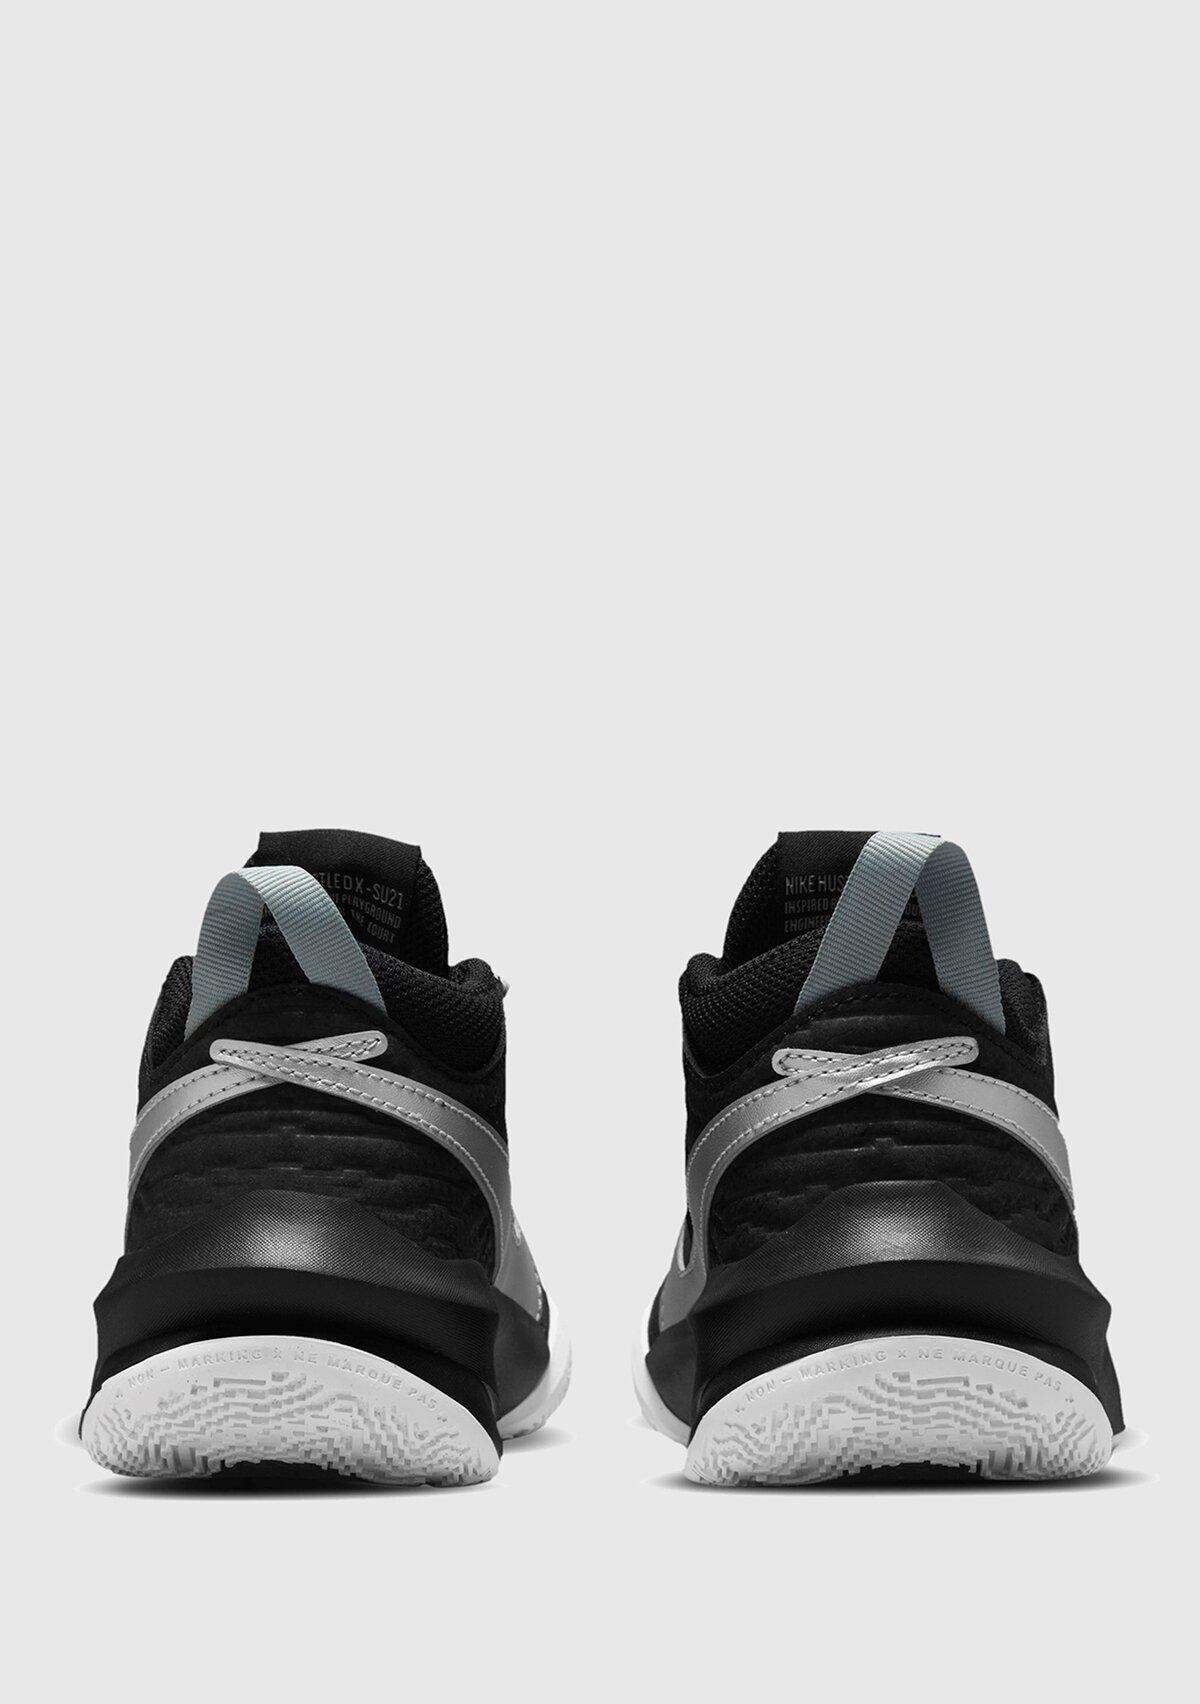 resm Team Hustle D 10 Siyah Unisex Basketbol Ayakkabısı